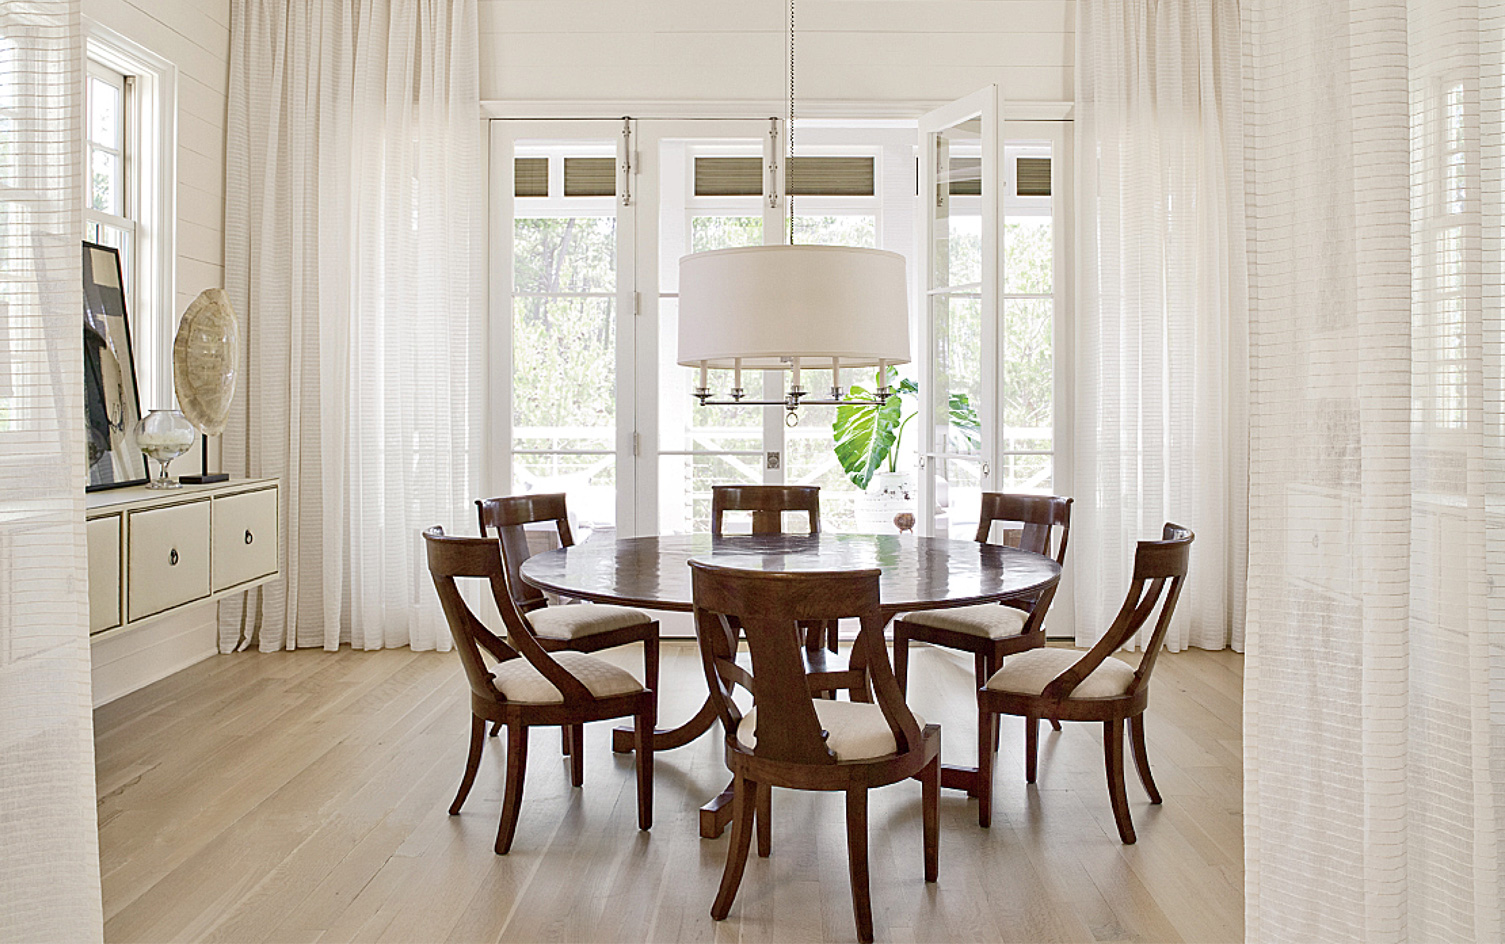 Paul Bates Architects || Architecture . Interiors . Furniture ...